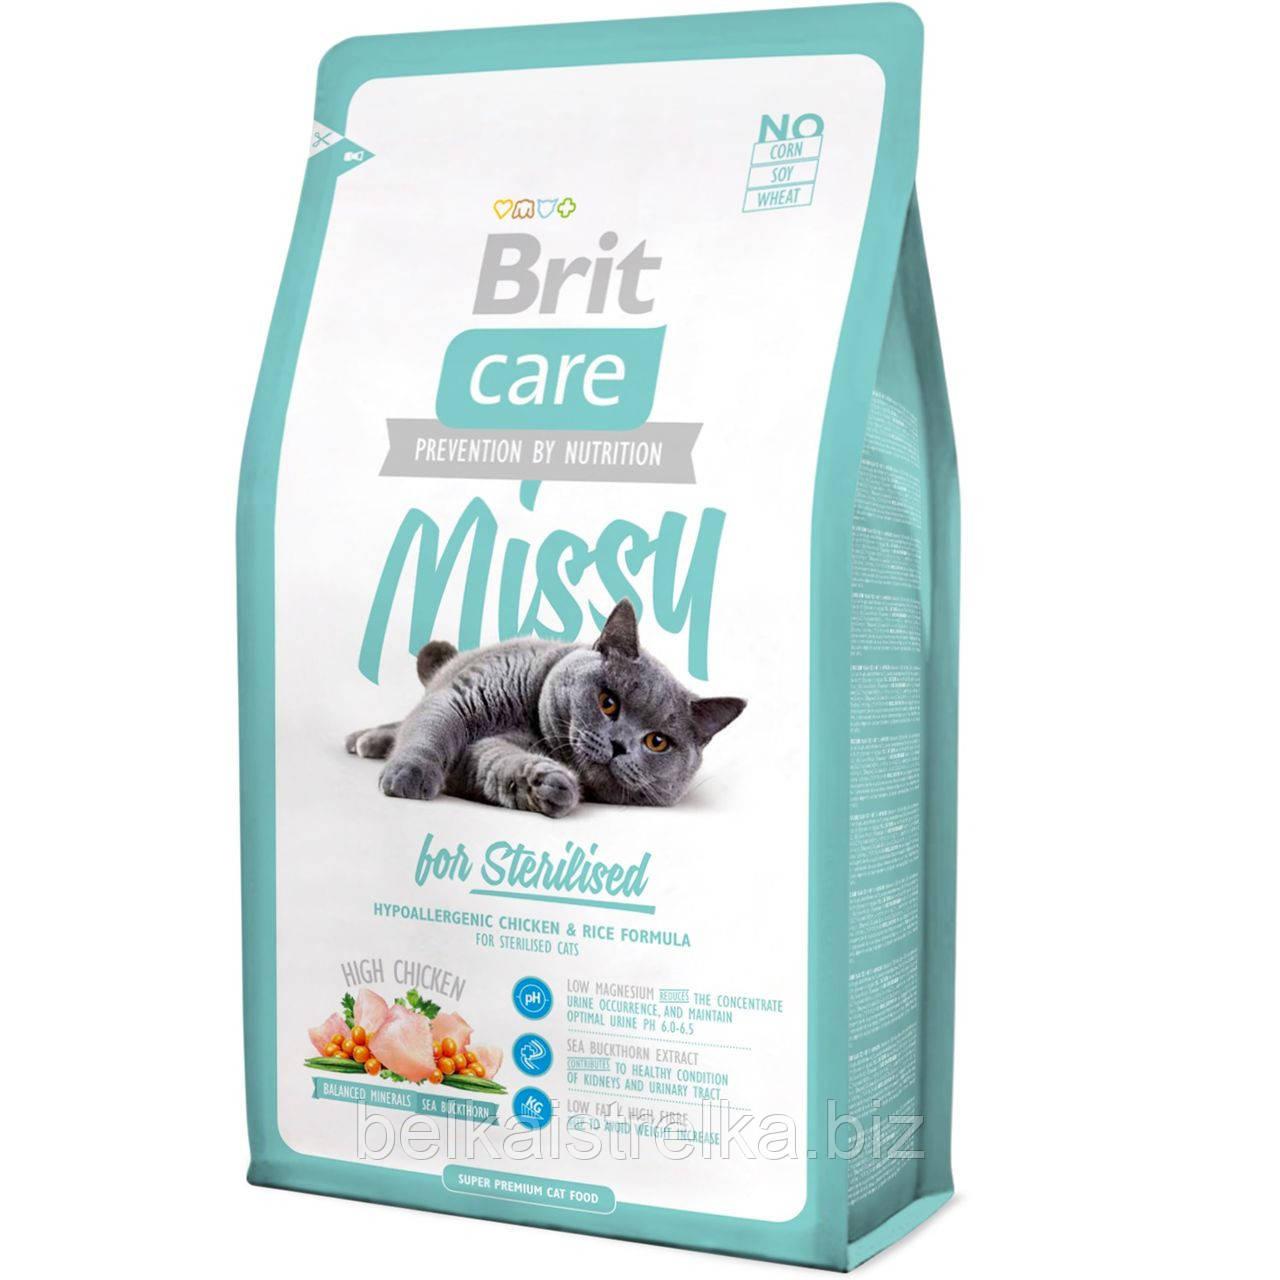 Корм Brit Care Cat Missy for Sterilised для стерилизованных кошек, 0,4 кг 132626 /5746